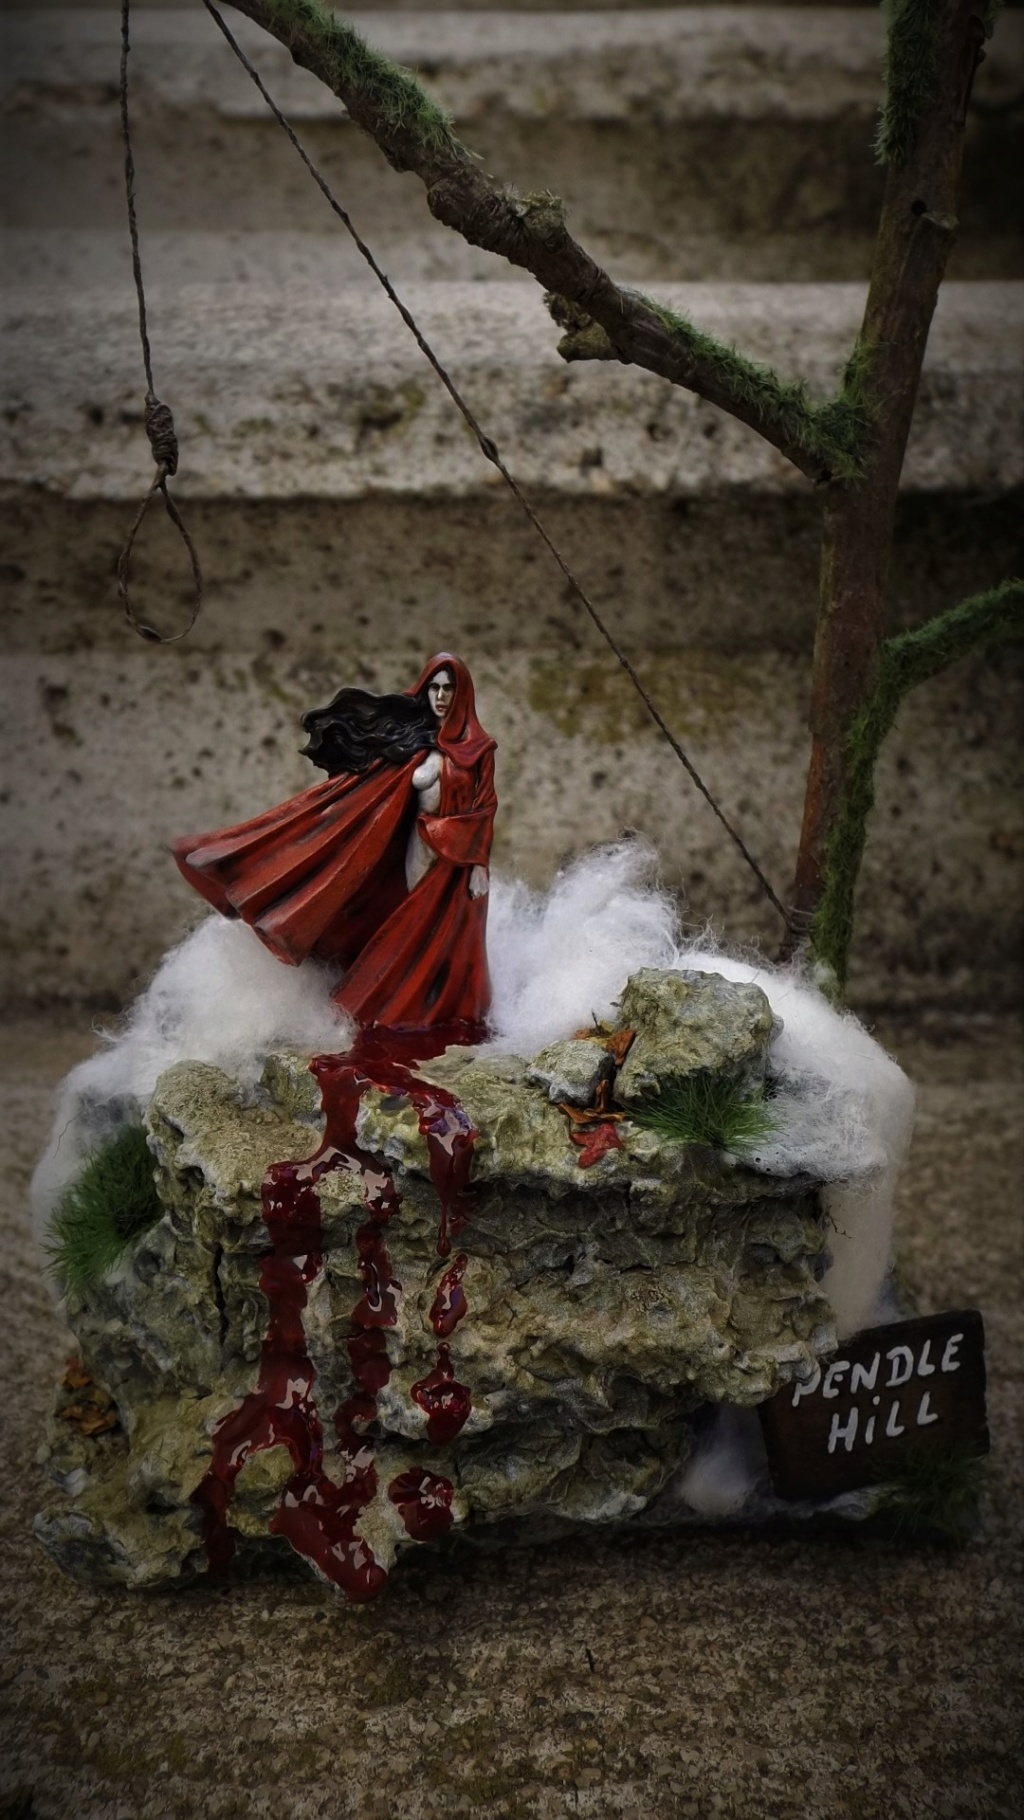 Mes dioramas - Diorama Pirates 06/2020 - Page 31 Dscf4310